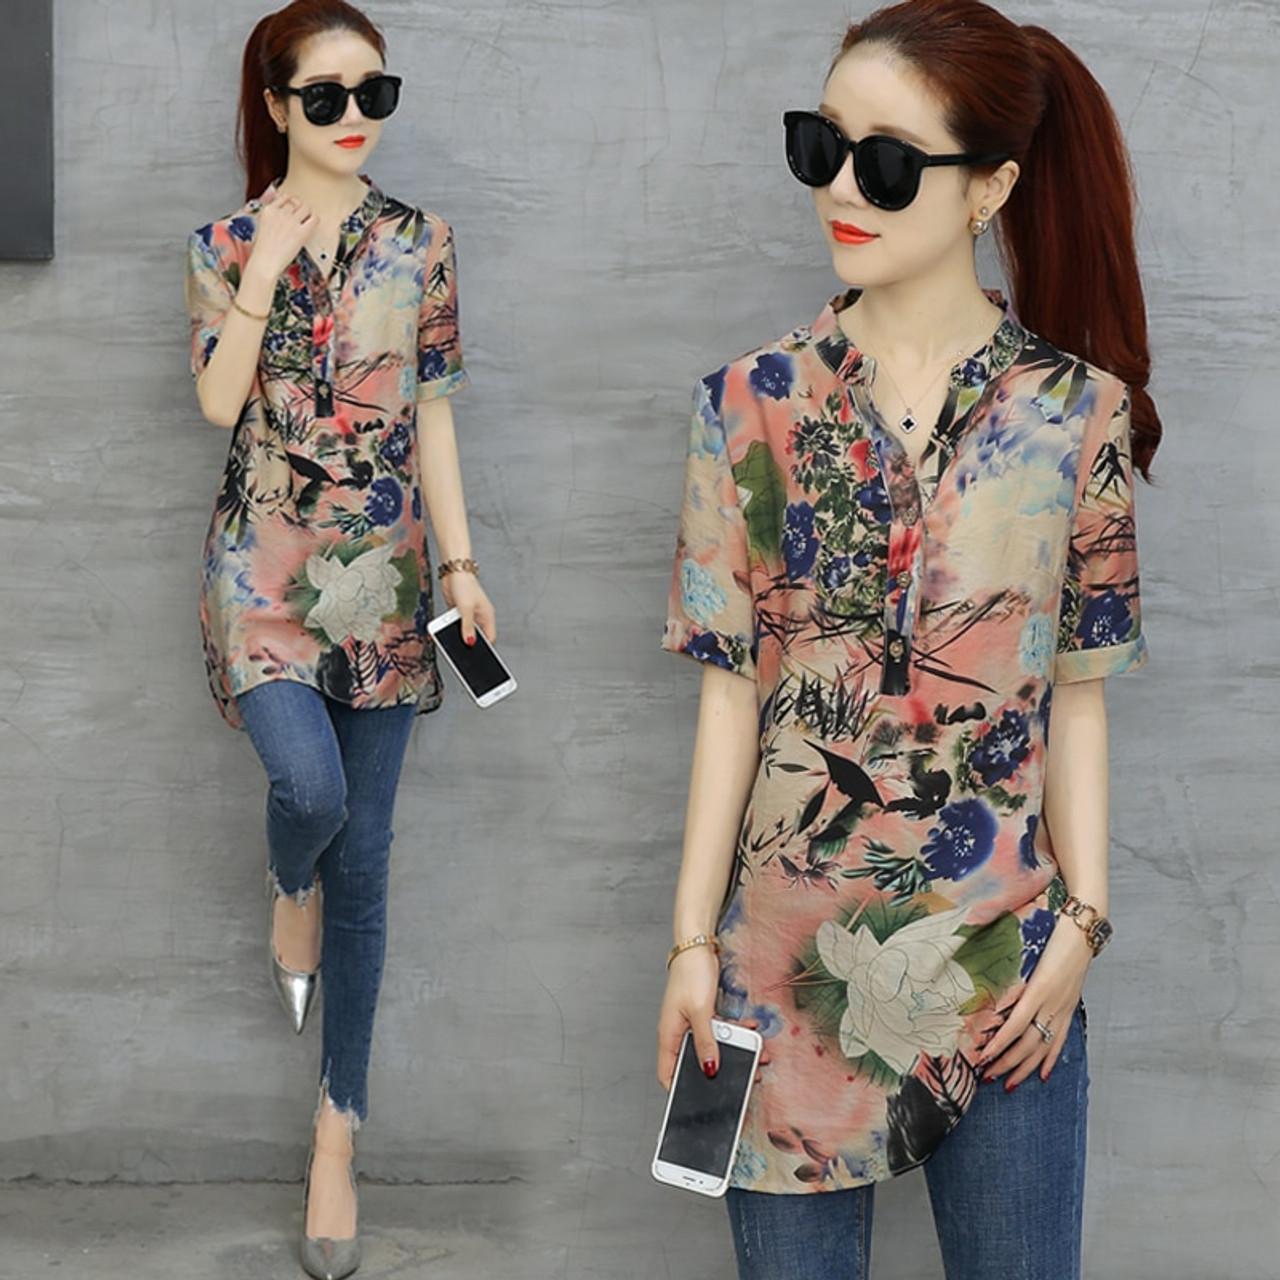 a3514e42666b1 4XL Plus Size Long Blouse Women Vintage Flower Printed Blouses 2018 Elegant  Lady Short Sleeve Shirt ...